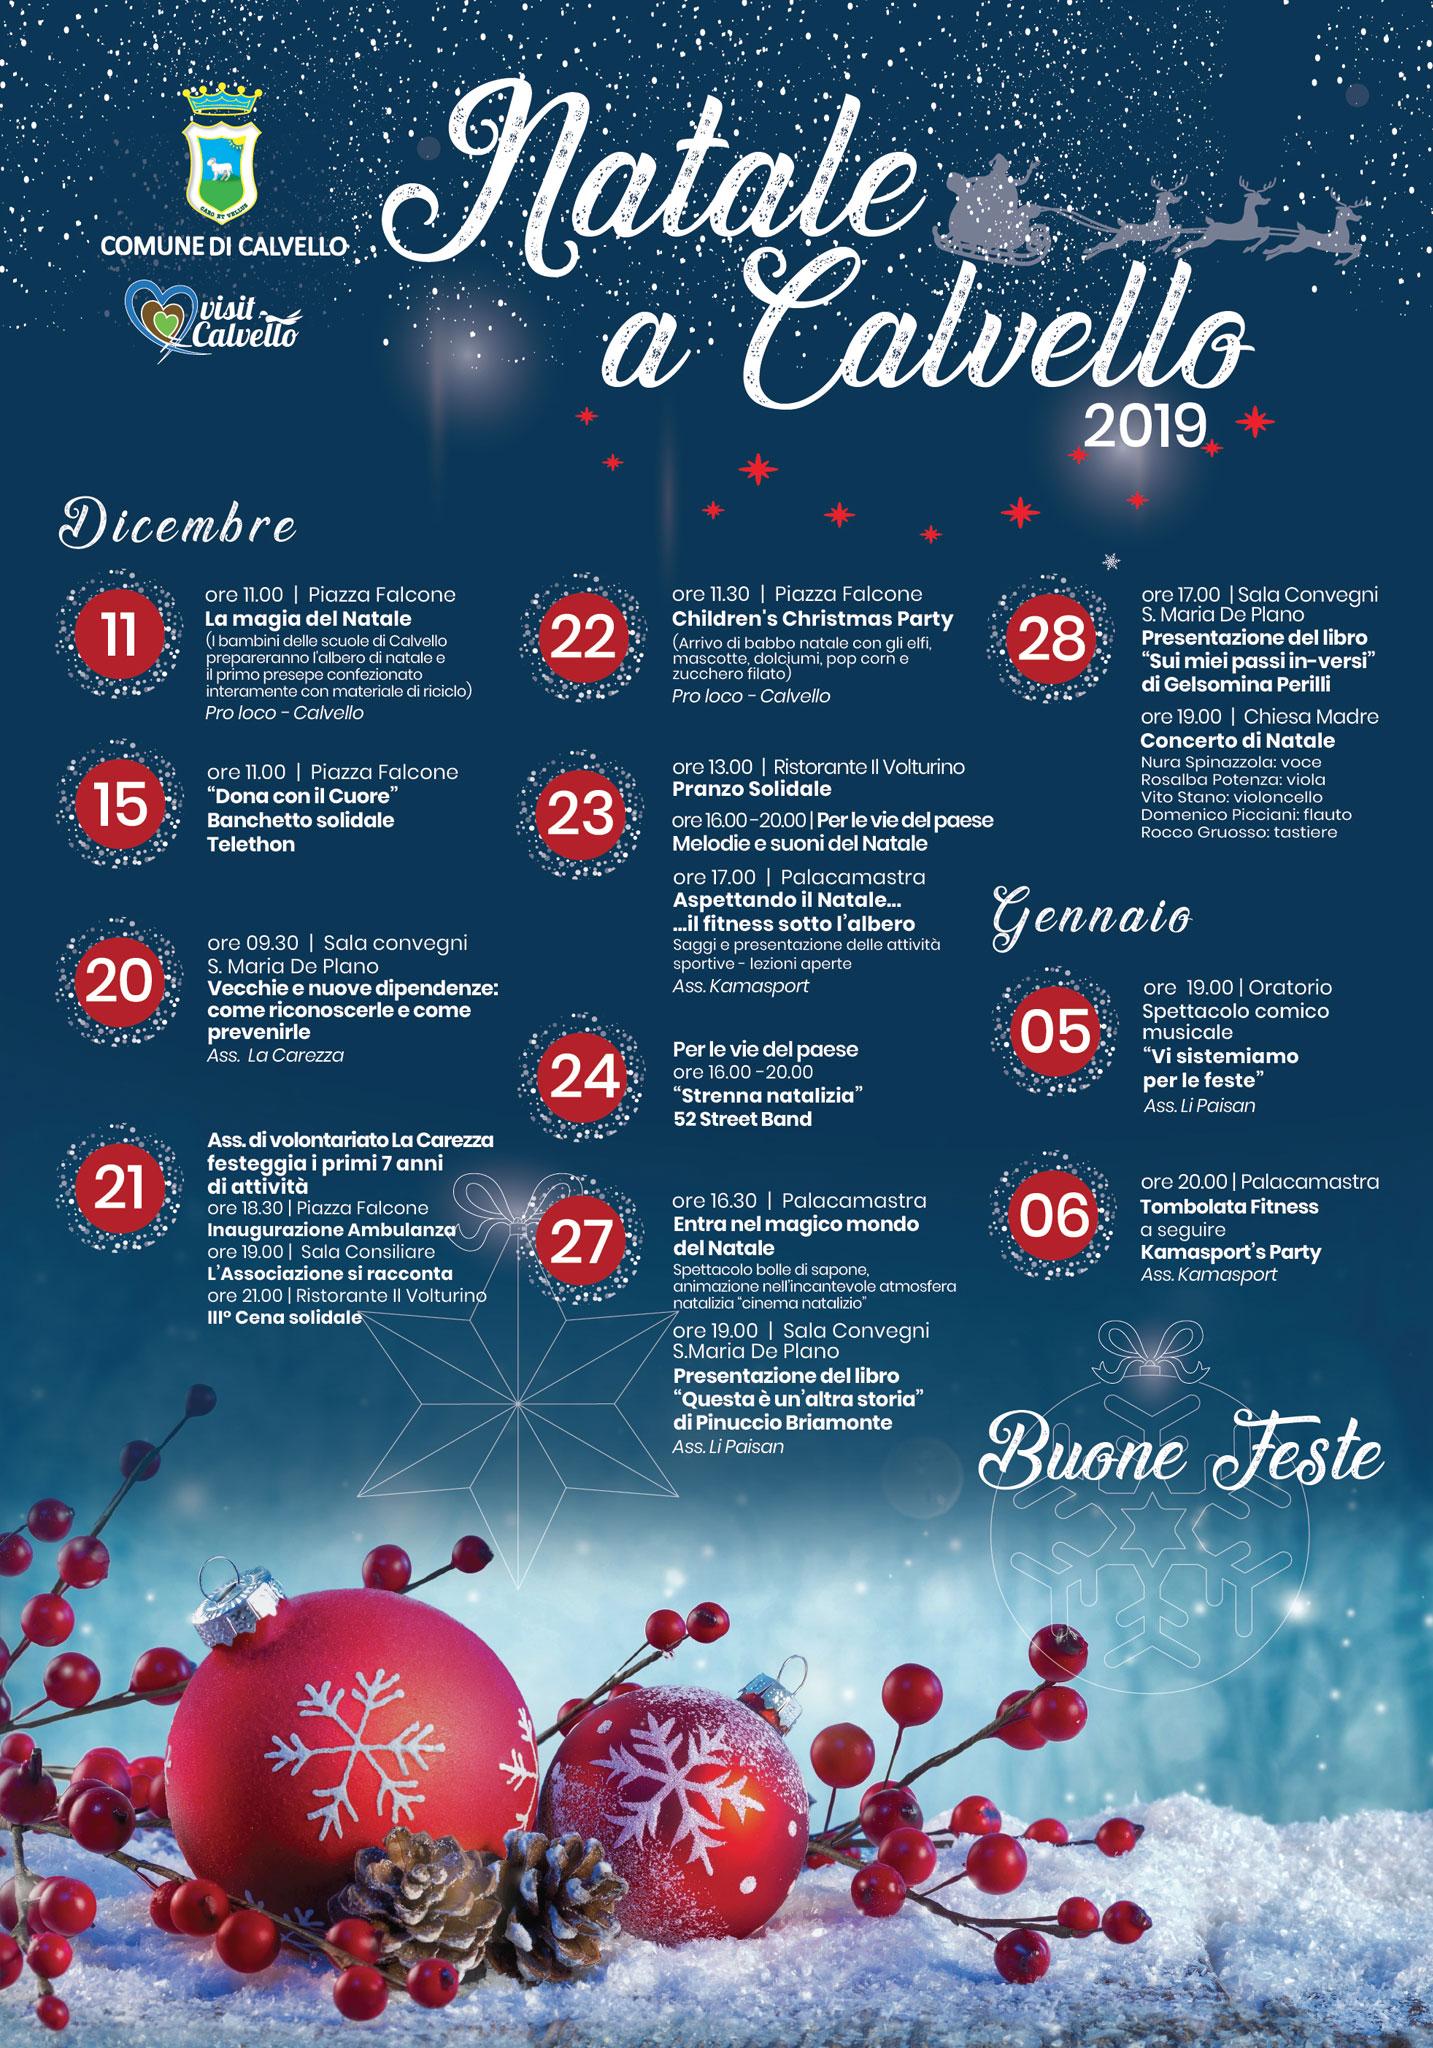 https://www.cuorebasilicata.it/wp-content/uploads/2019/12/calvello.jpg